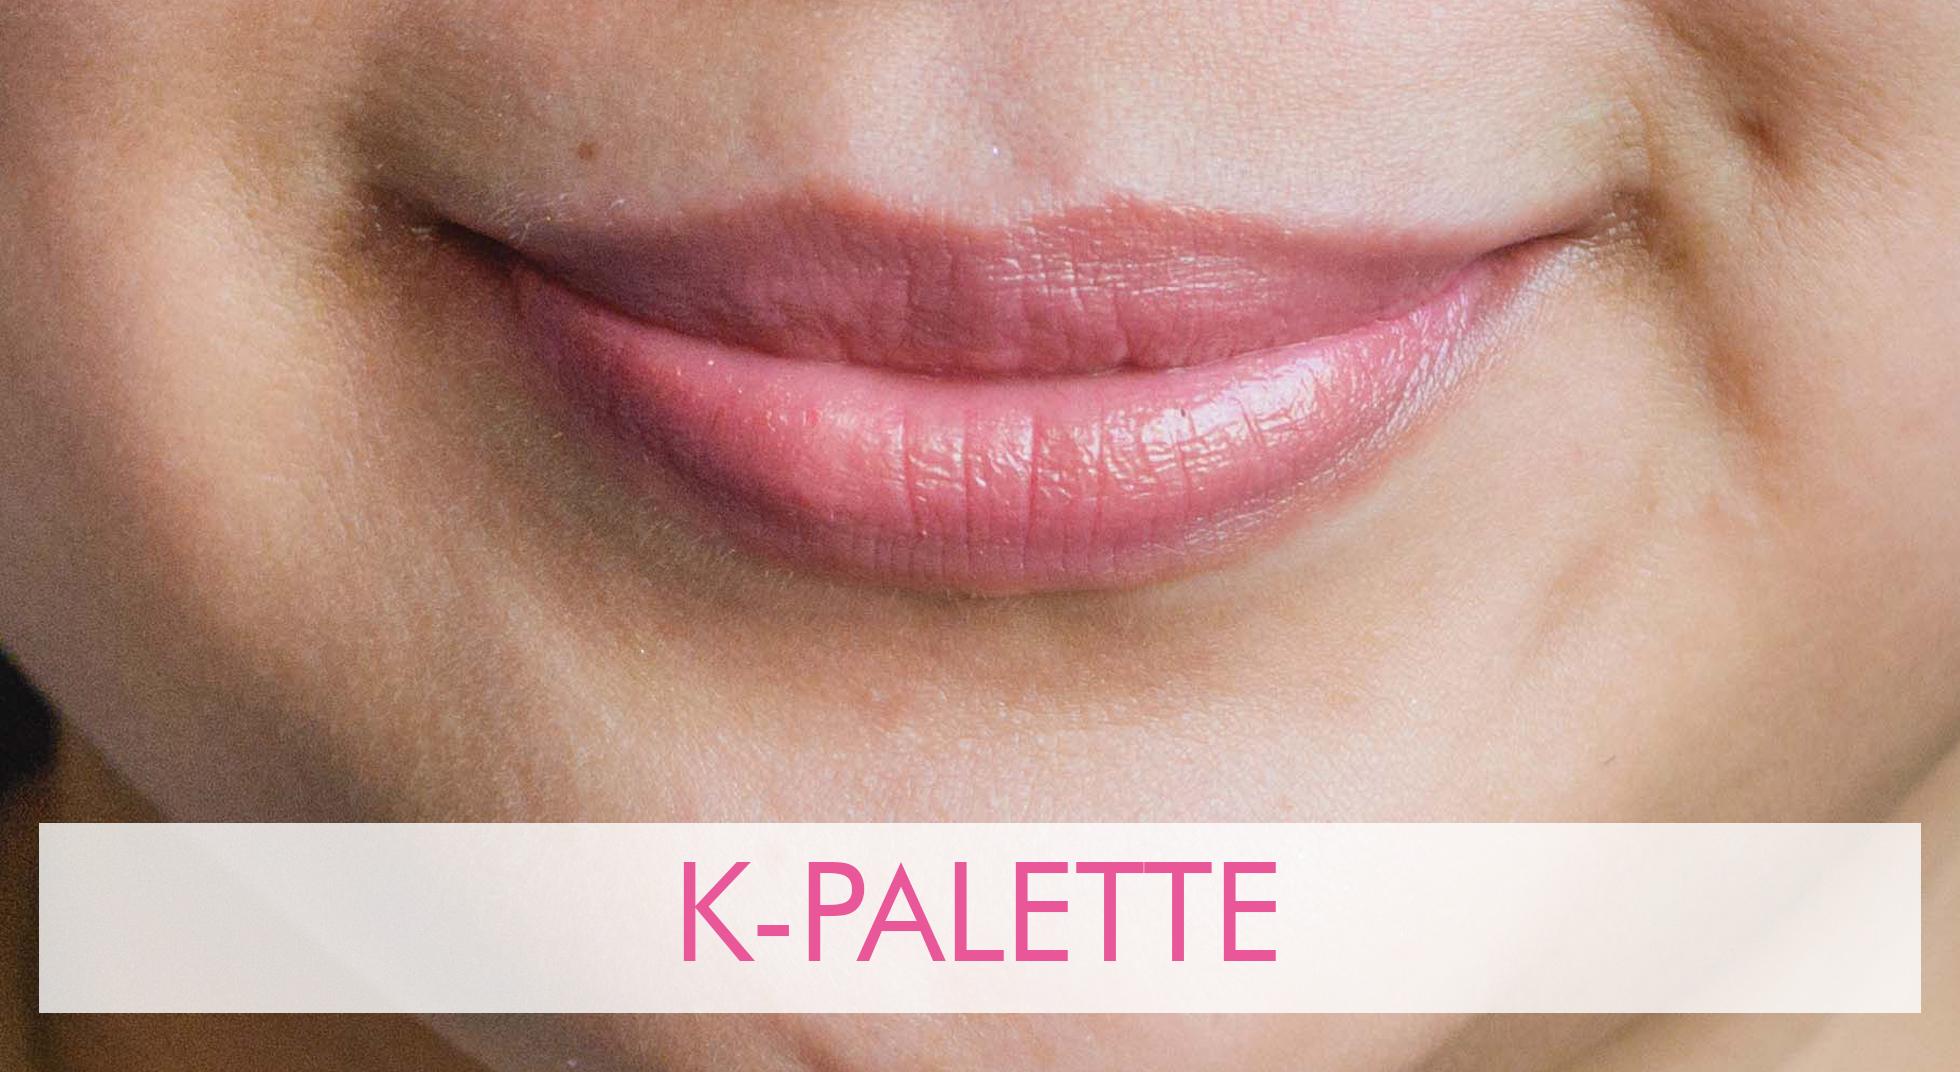 K-PALETTE_tinted-lip-balms_nivea-revlon-burts-bees-canmake-make-up-for-ever-happy-skin-lip-ice-k-palette-bobbi-brown_review-philippines_2019.jpg